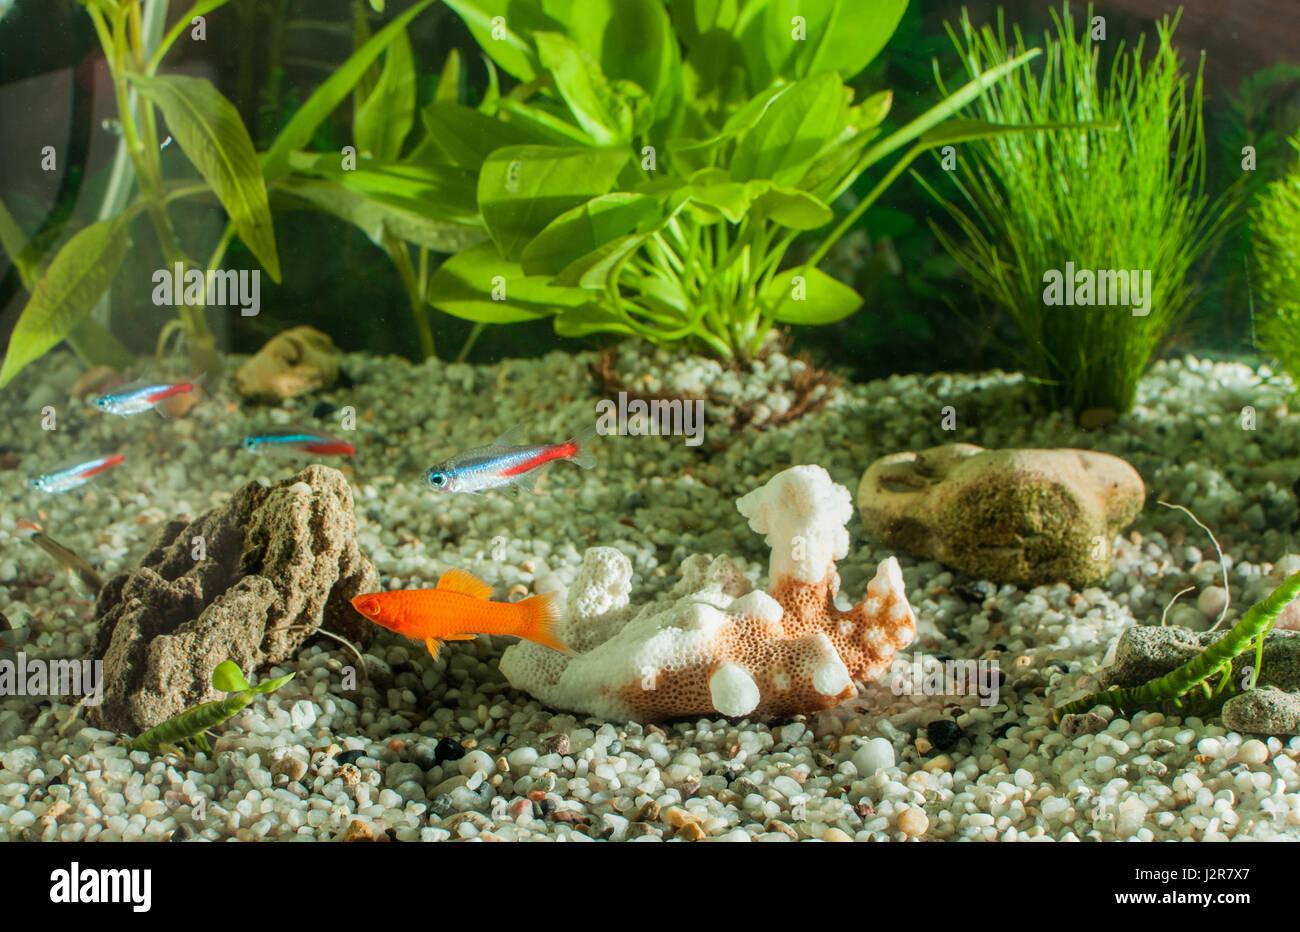 Fish for natural aquarium - Aquarium With Many Fish And Natural Plants And Sand Tropical Fishes Aquarium With Green